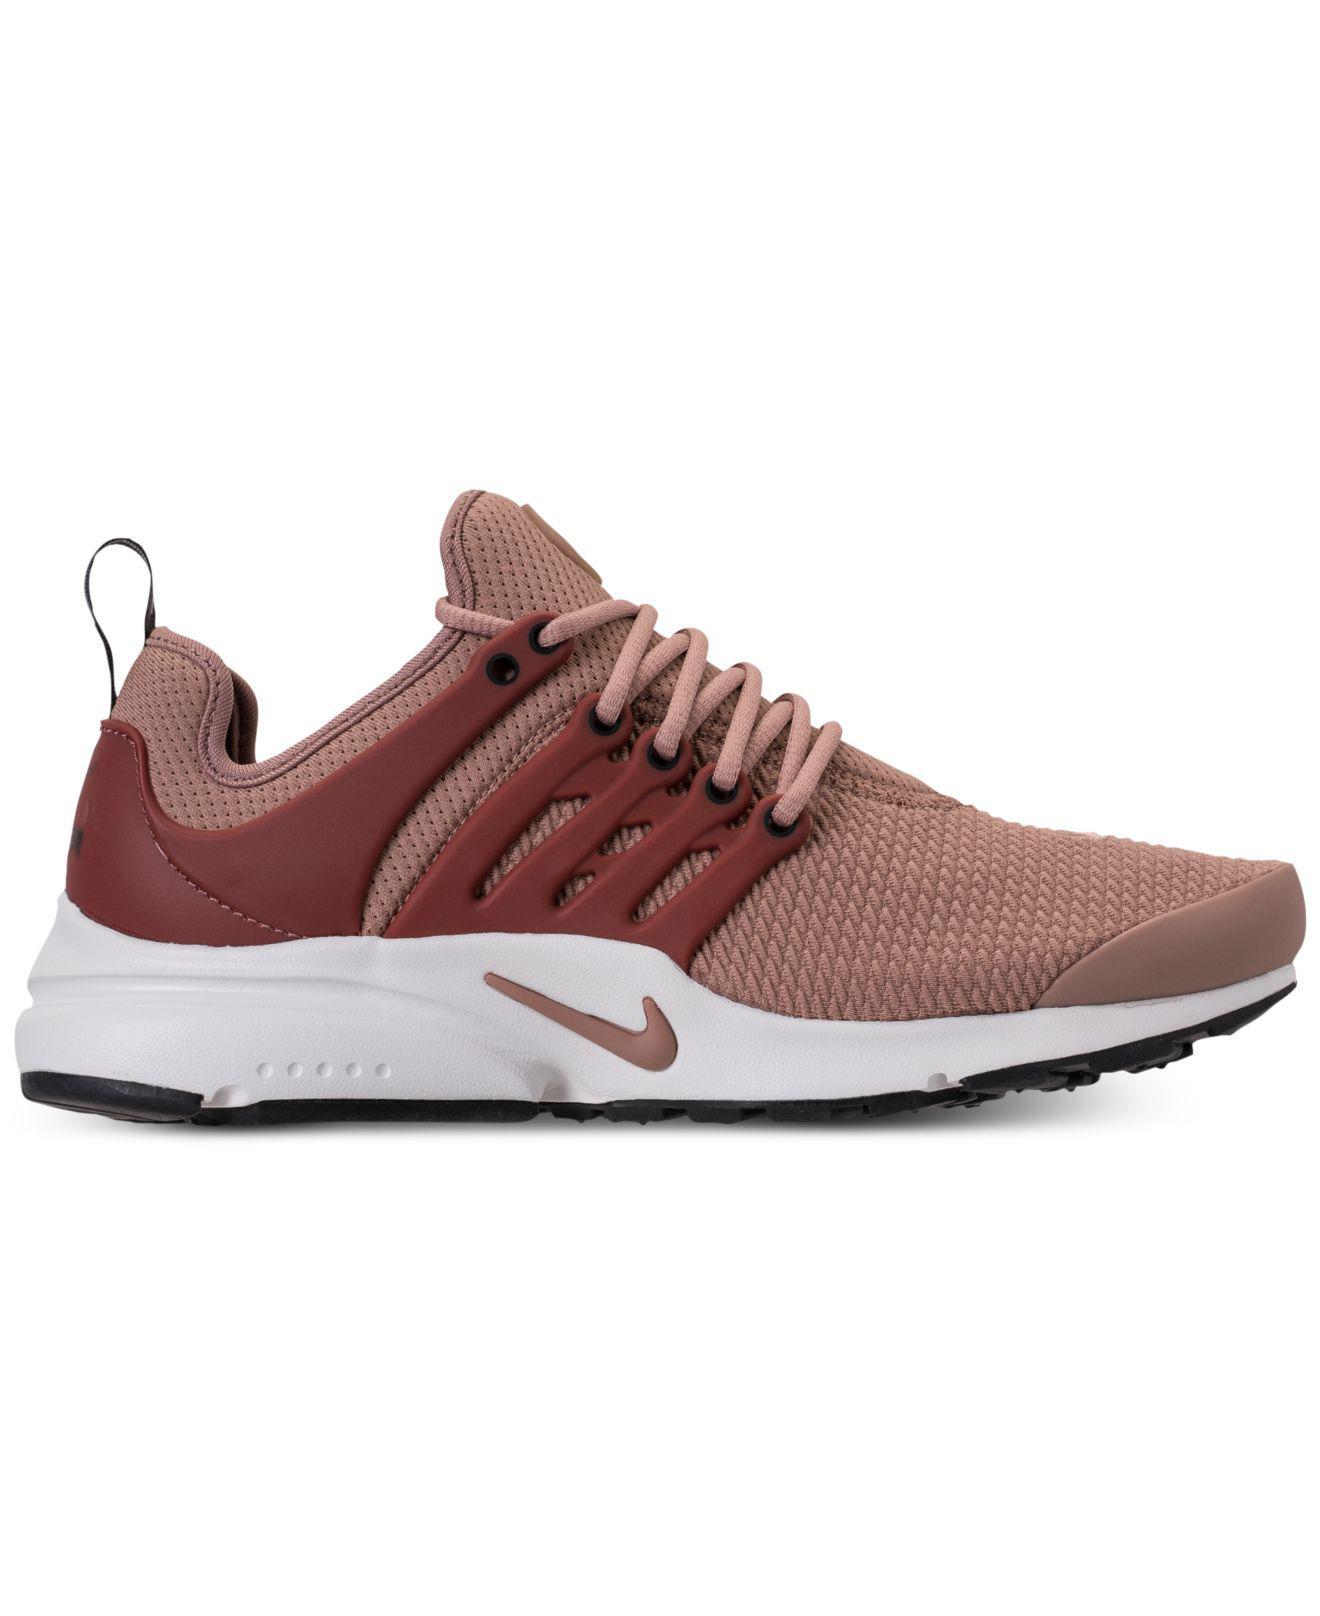 3571c7f7cccf ... denmark lyst nike air presto running sneakers from finish line 0fc4b  3c2f7